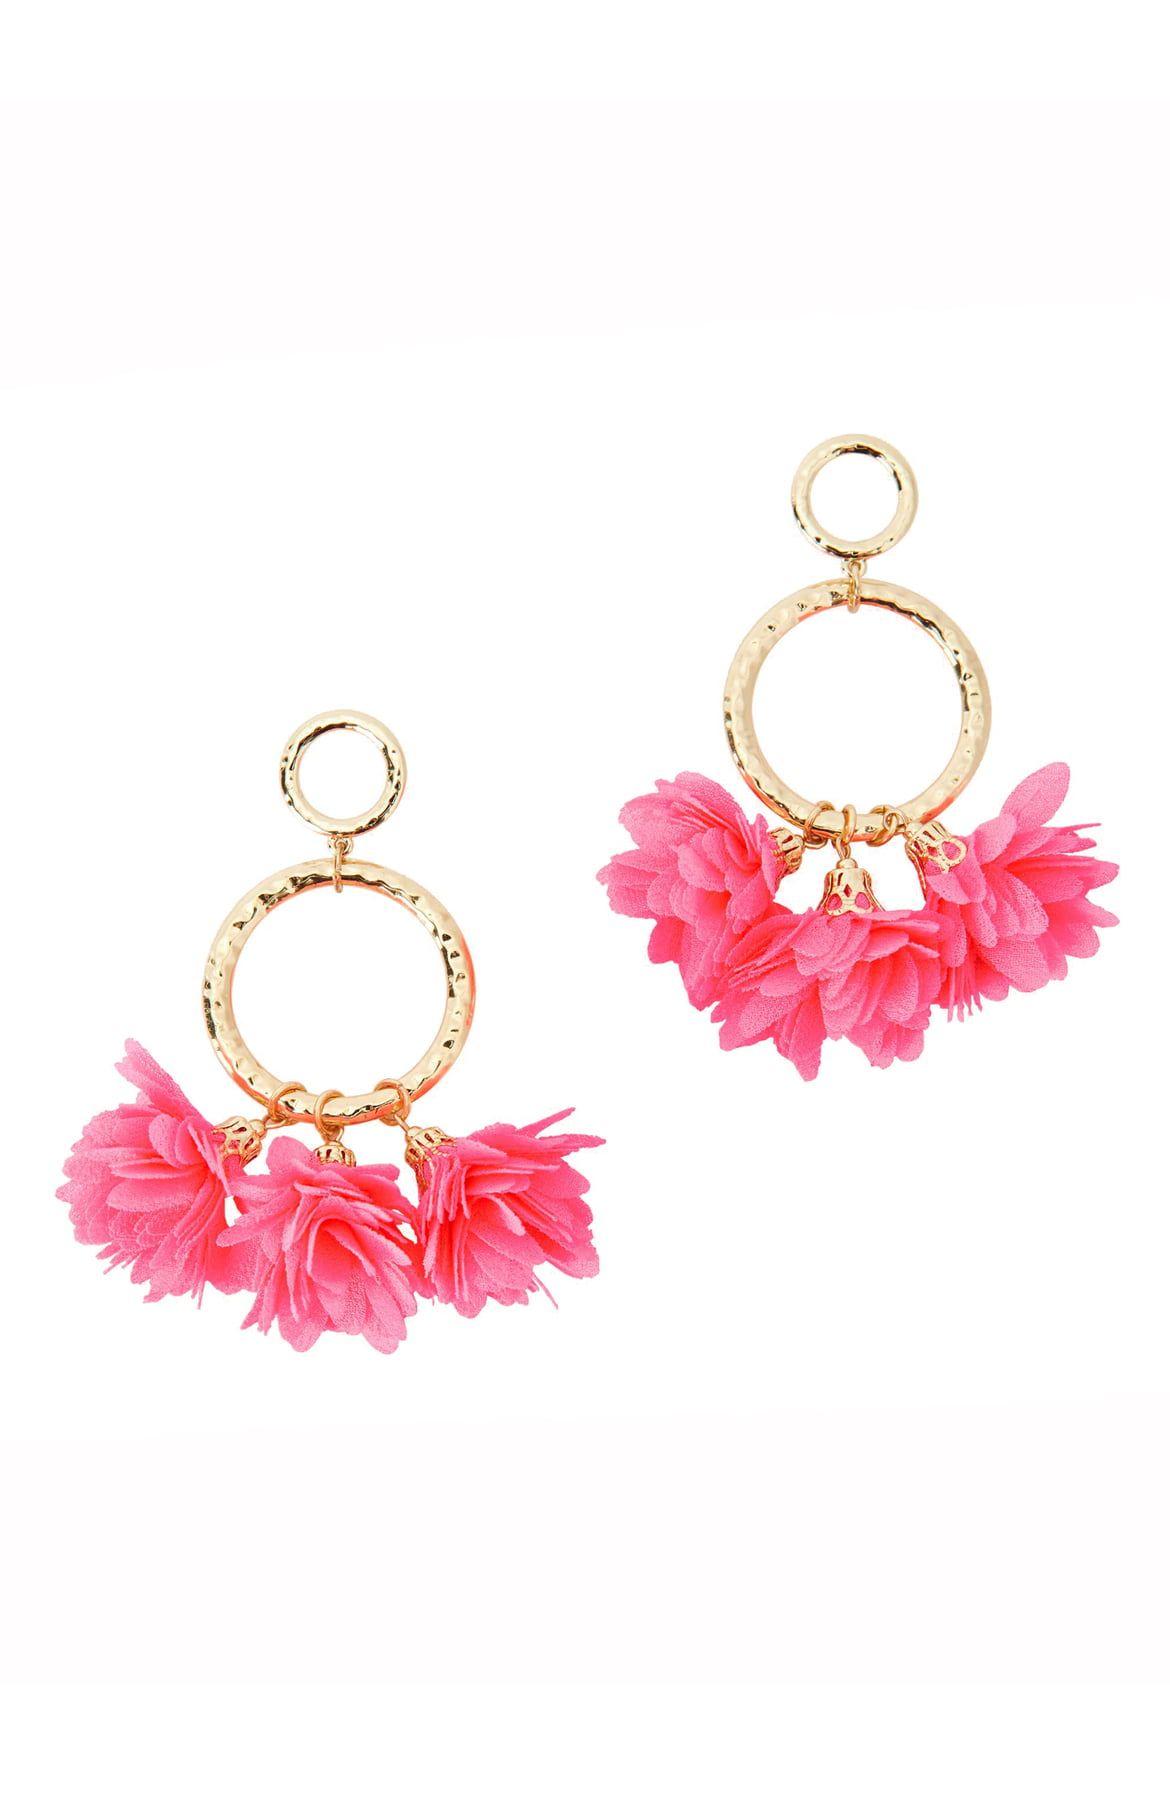 Cascading Petals Hoop Earrings Pink Tropics Lilly Pulitzer Jewelry Trends Earrings